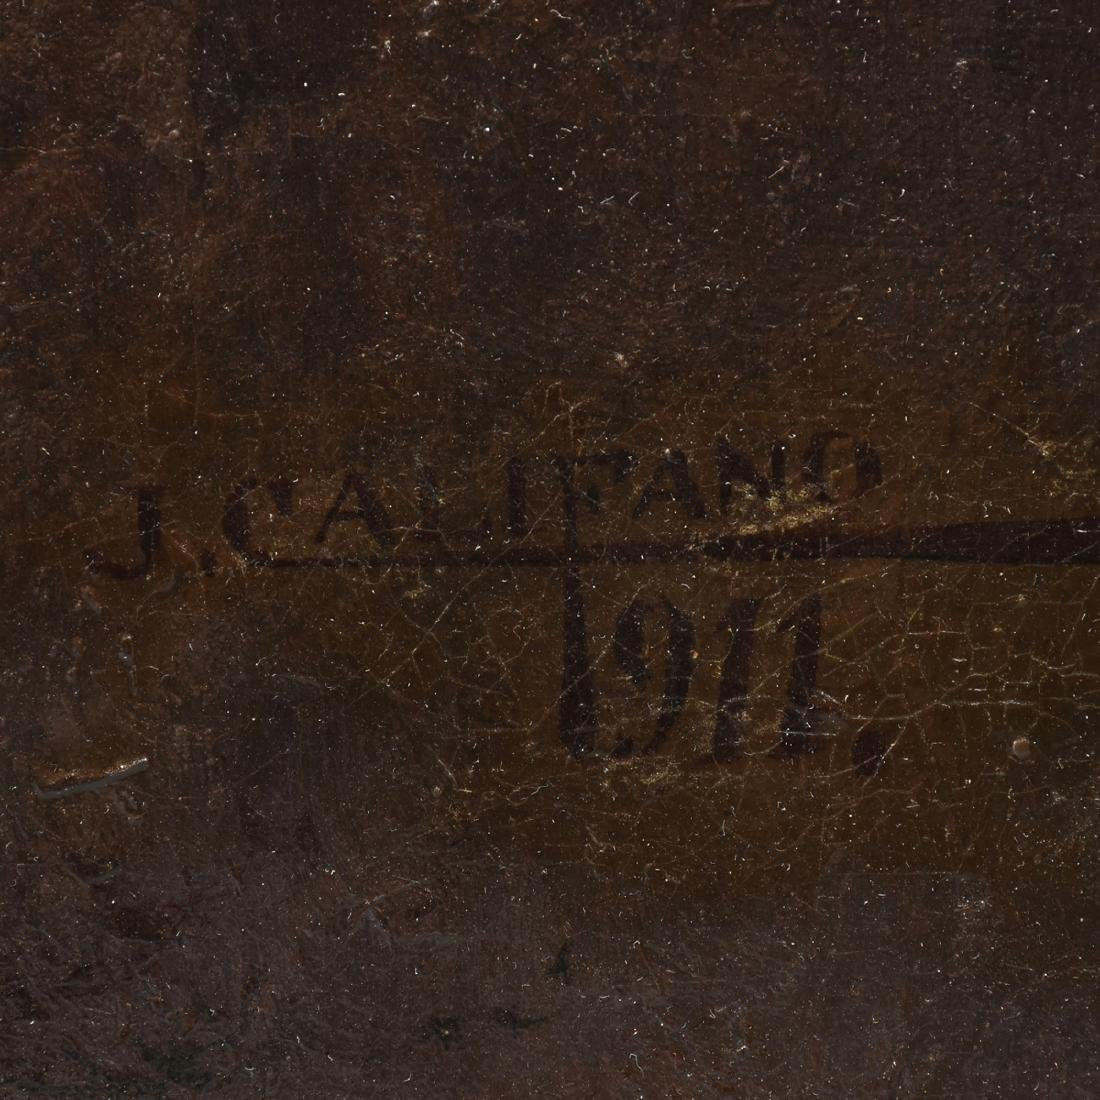 JOHN EDMUND CALIFANO (Italian/American 1862/64-1946) A - 3